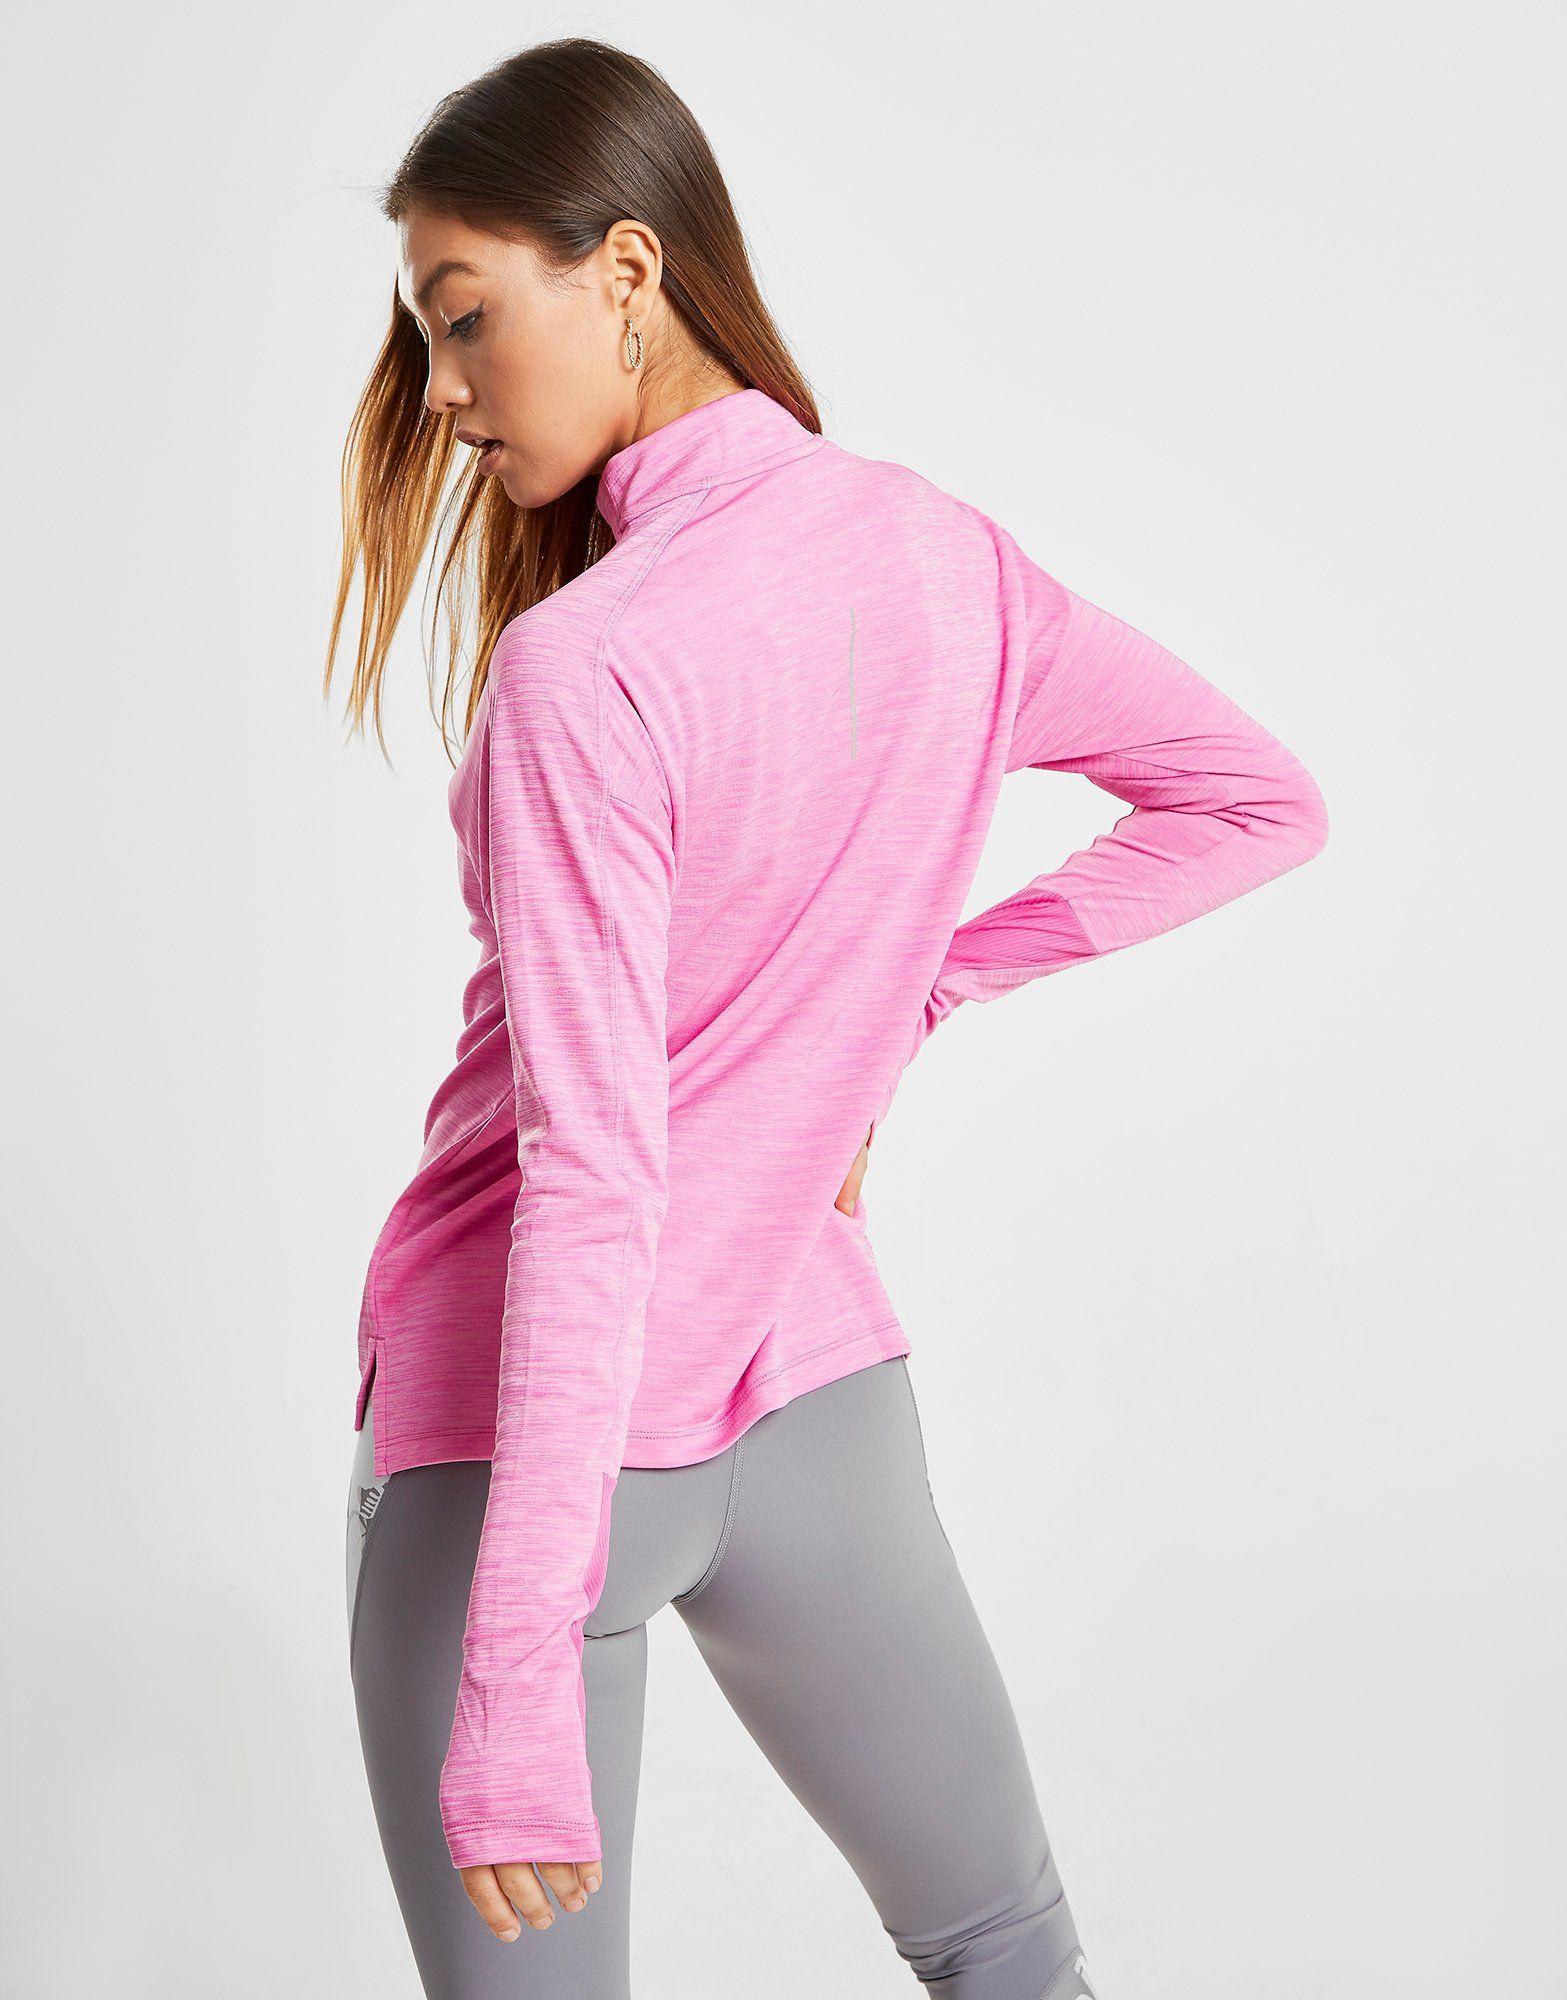 Nike Running Top Damen